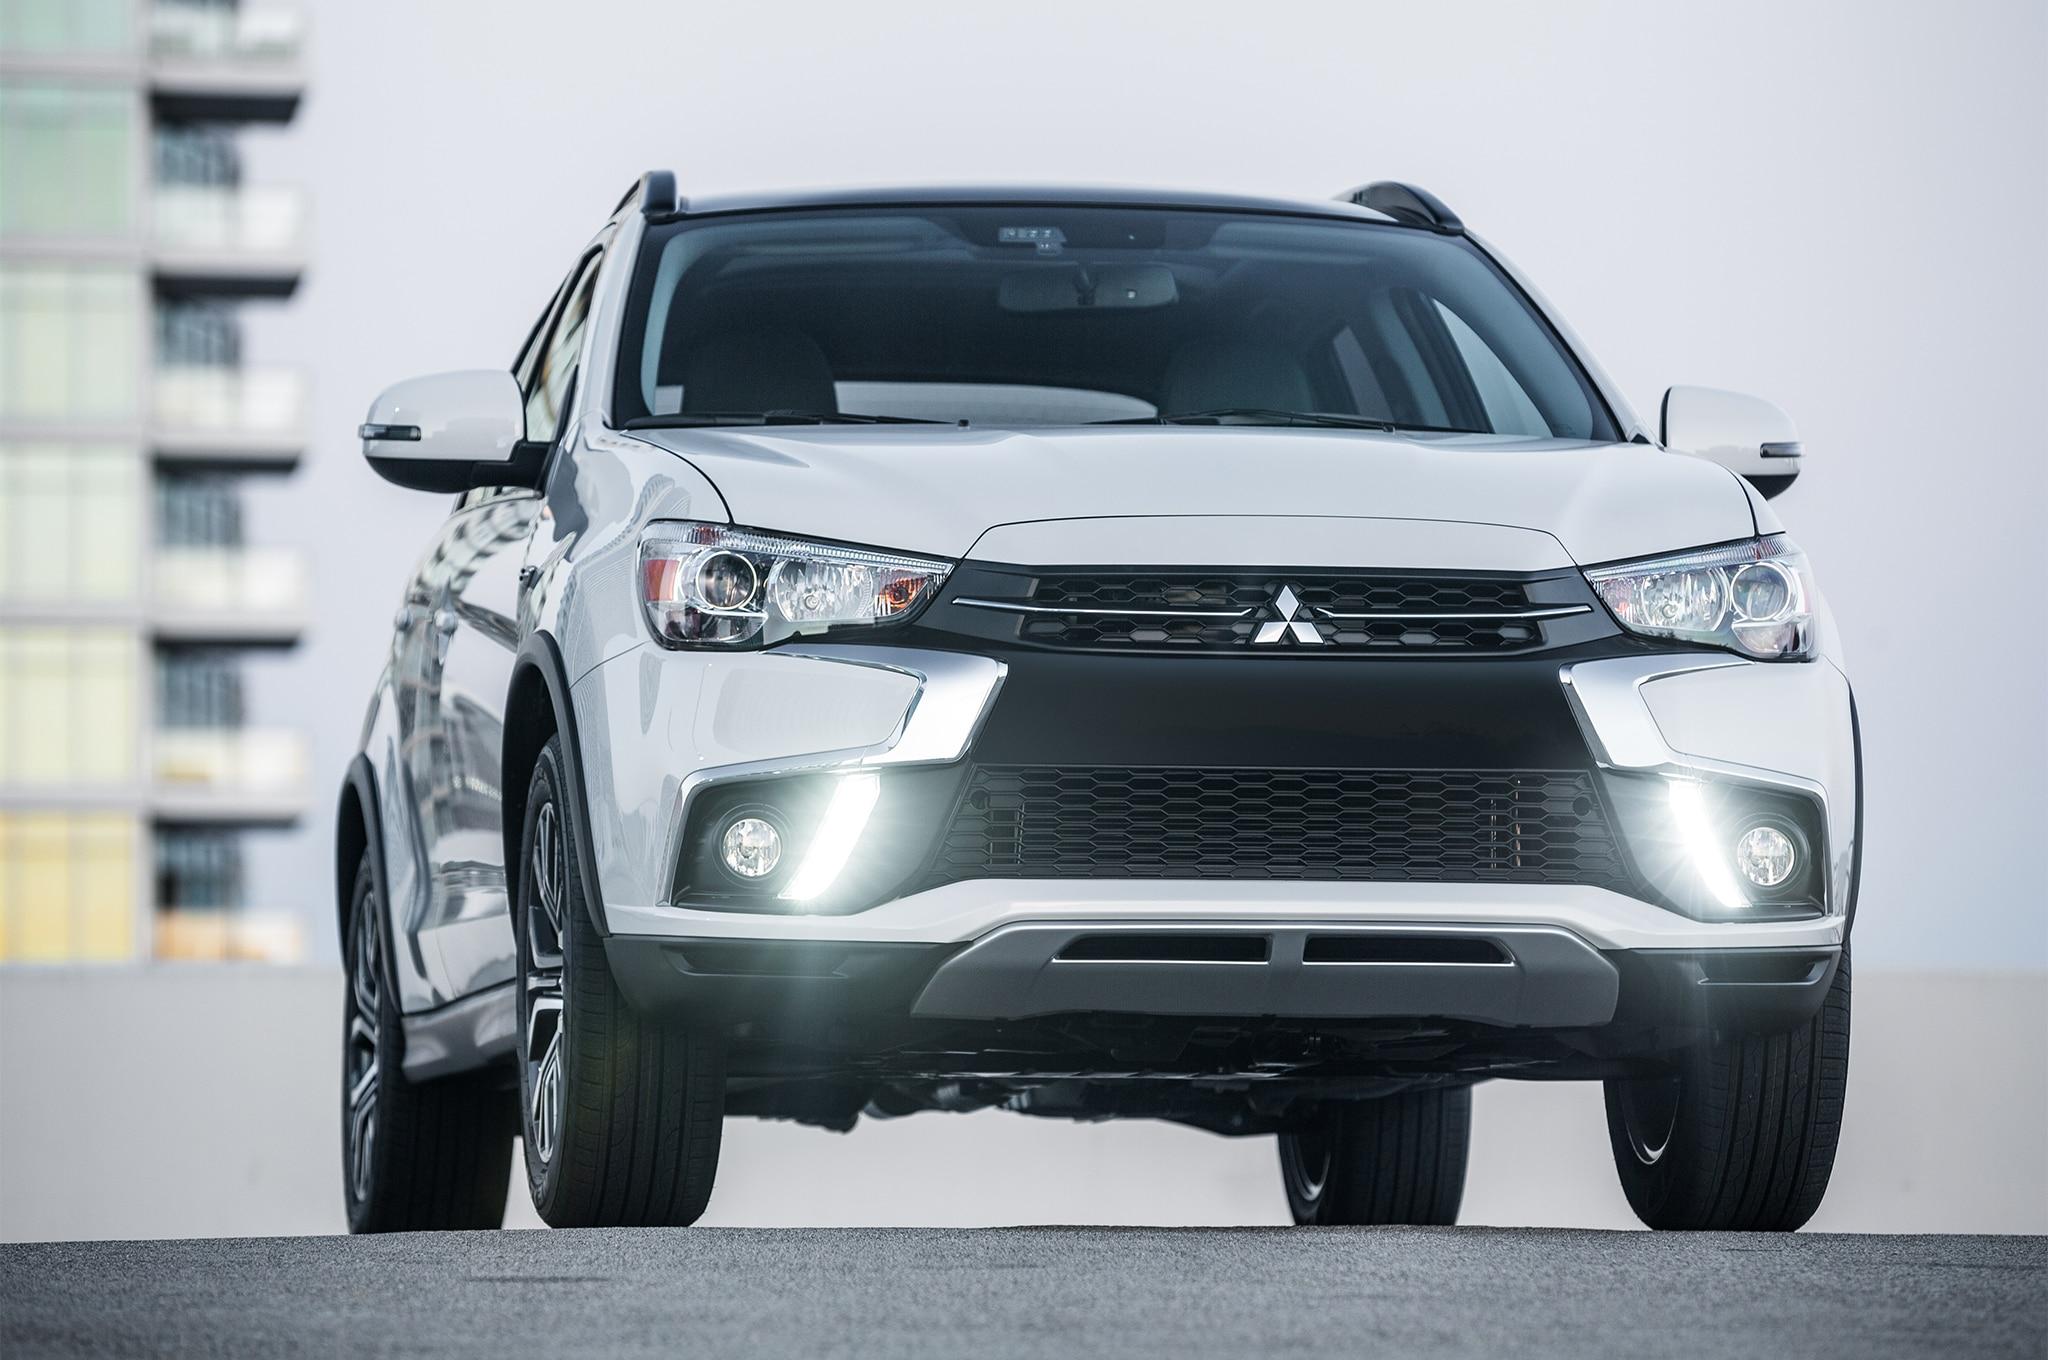 2018 Mitsubishi Outlander Sport 2 4 Sel Awc Quick Take Review